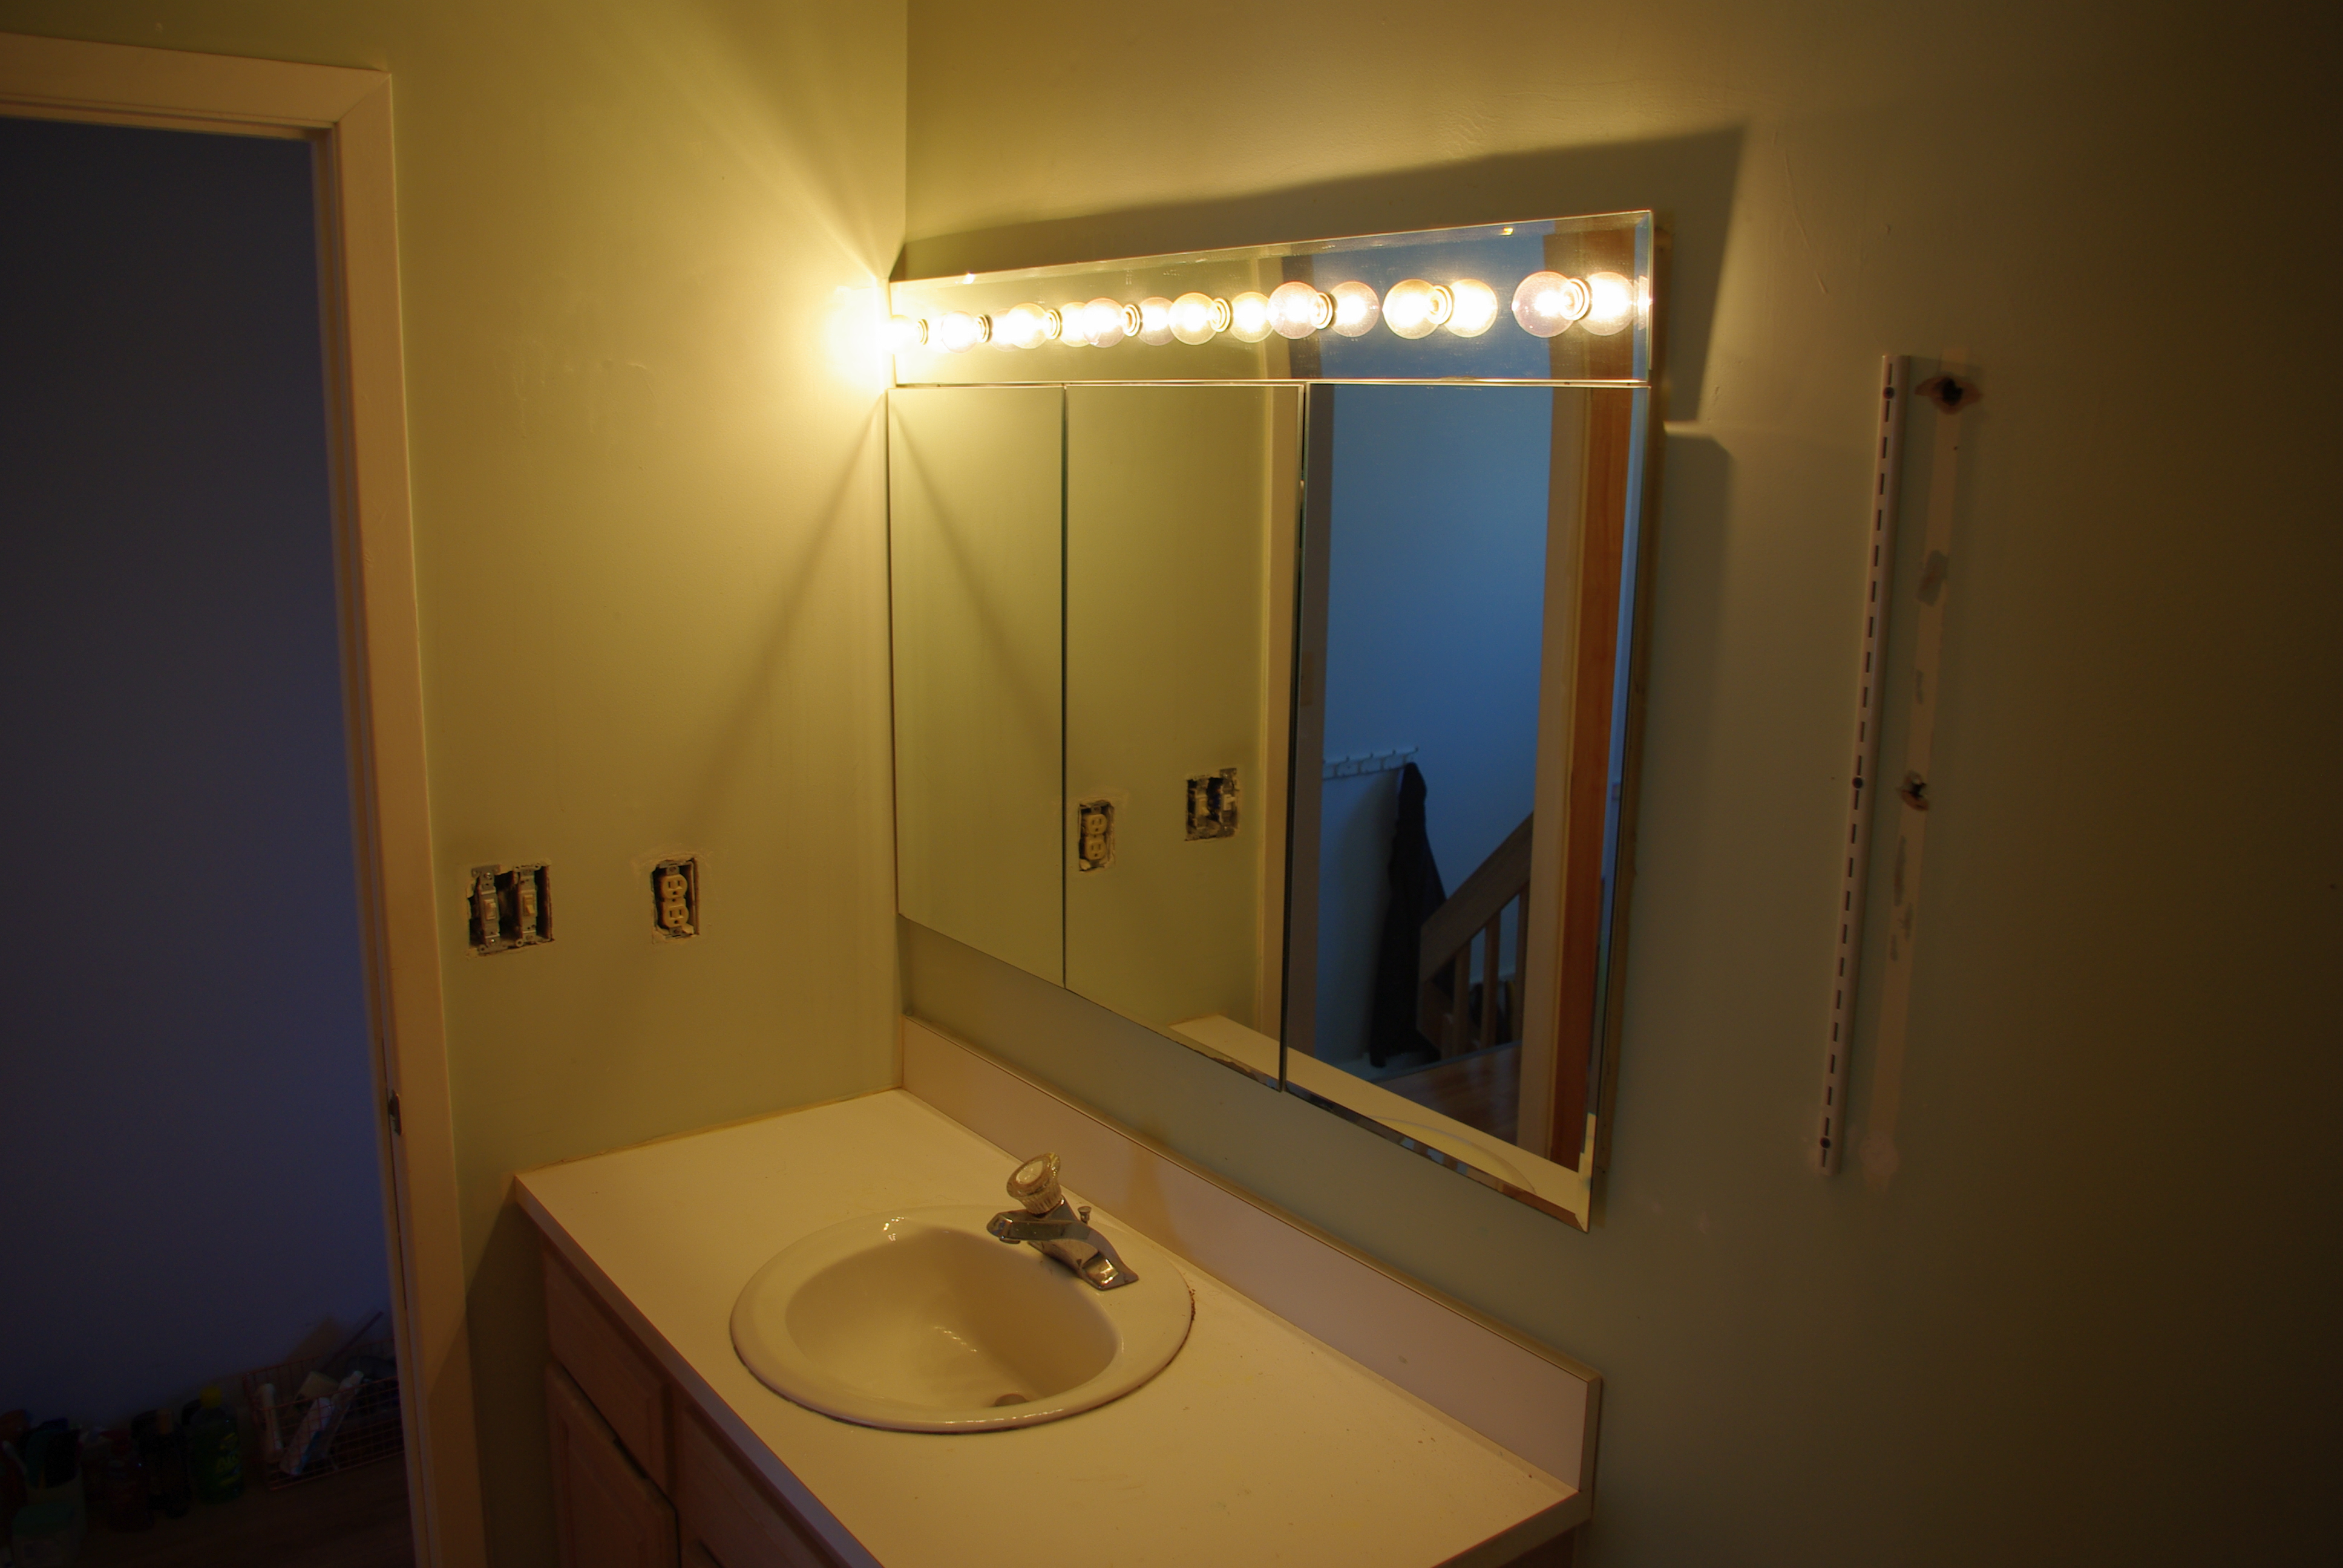 Bathroom Paint Job 2 Flickr Photo Sharing